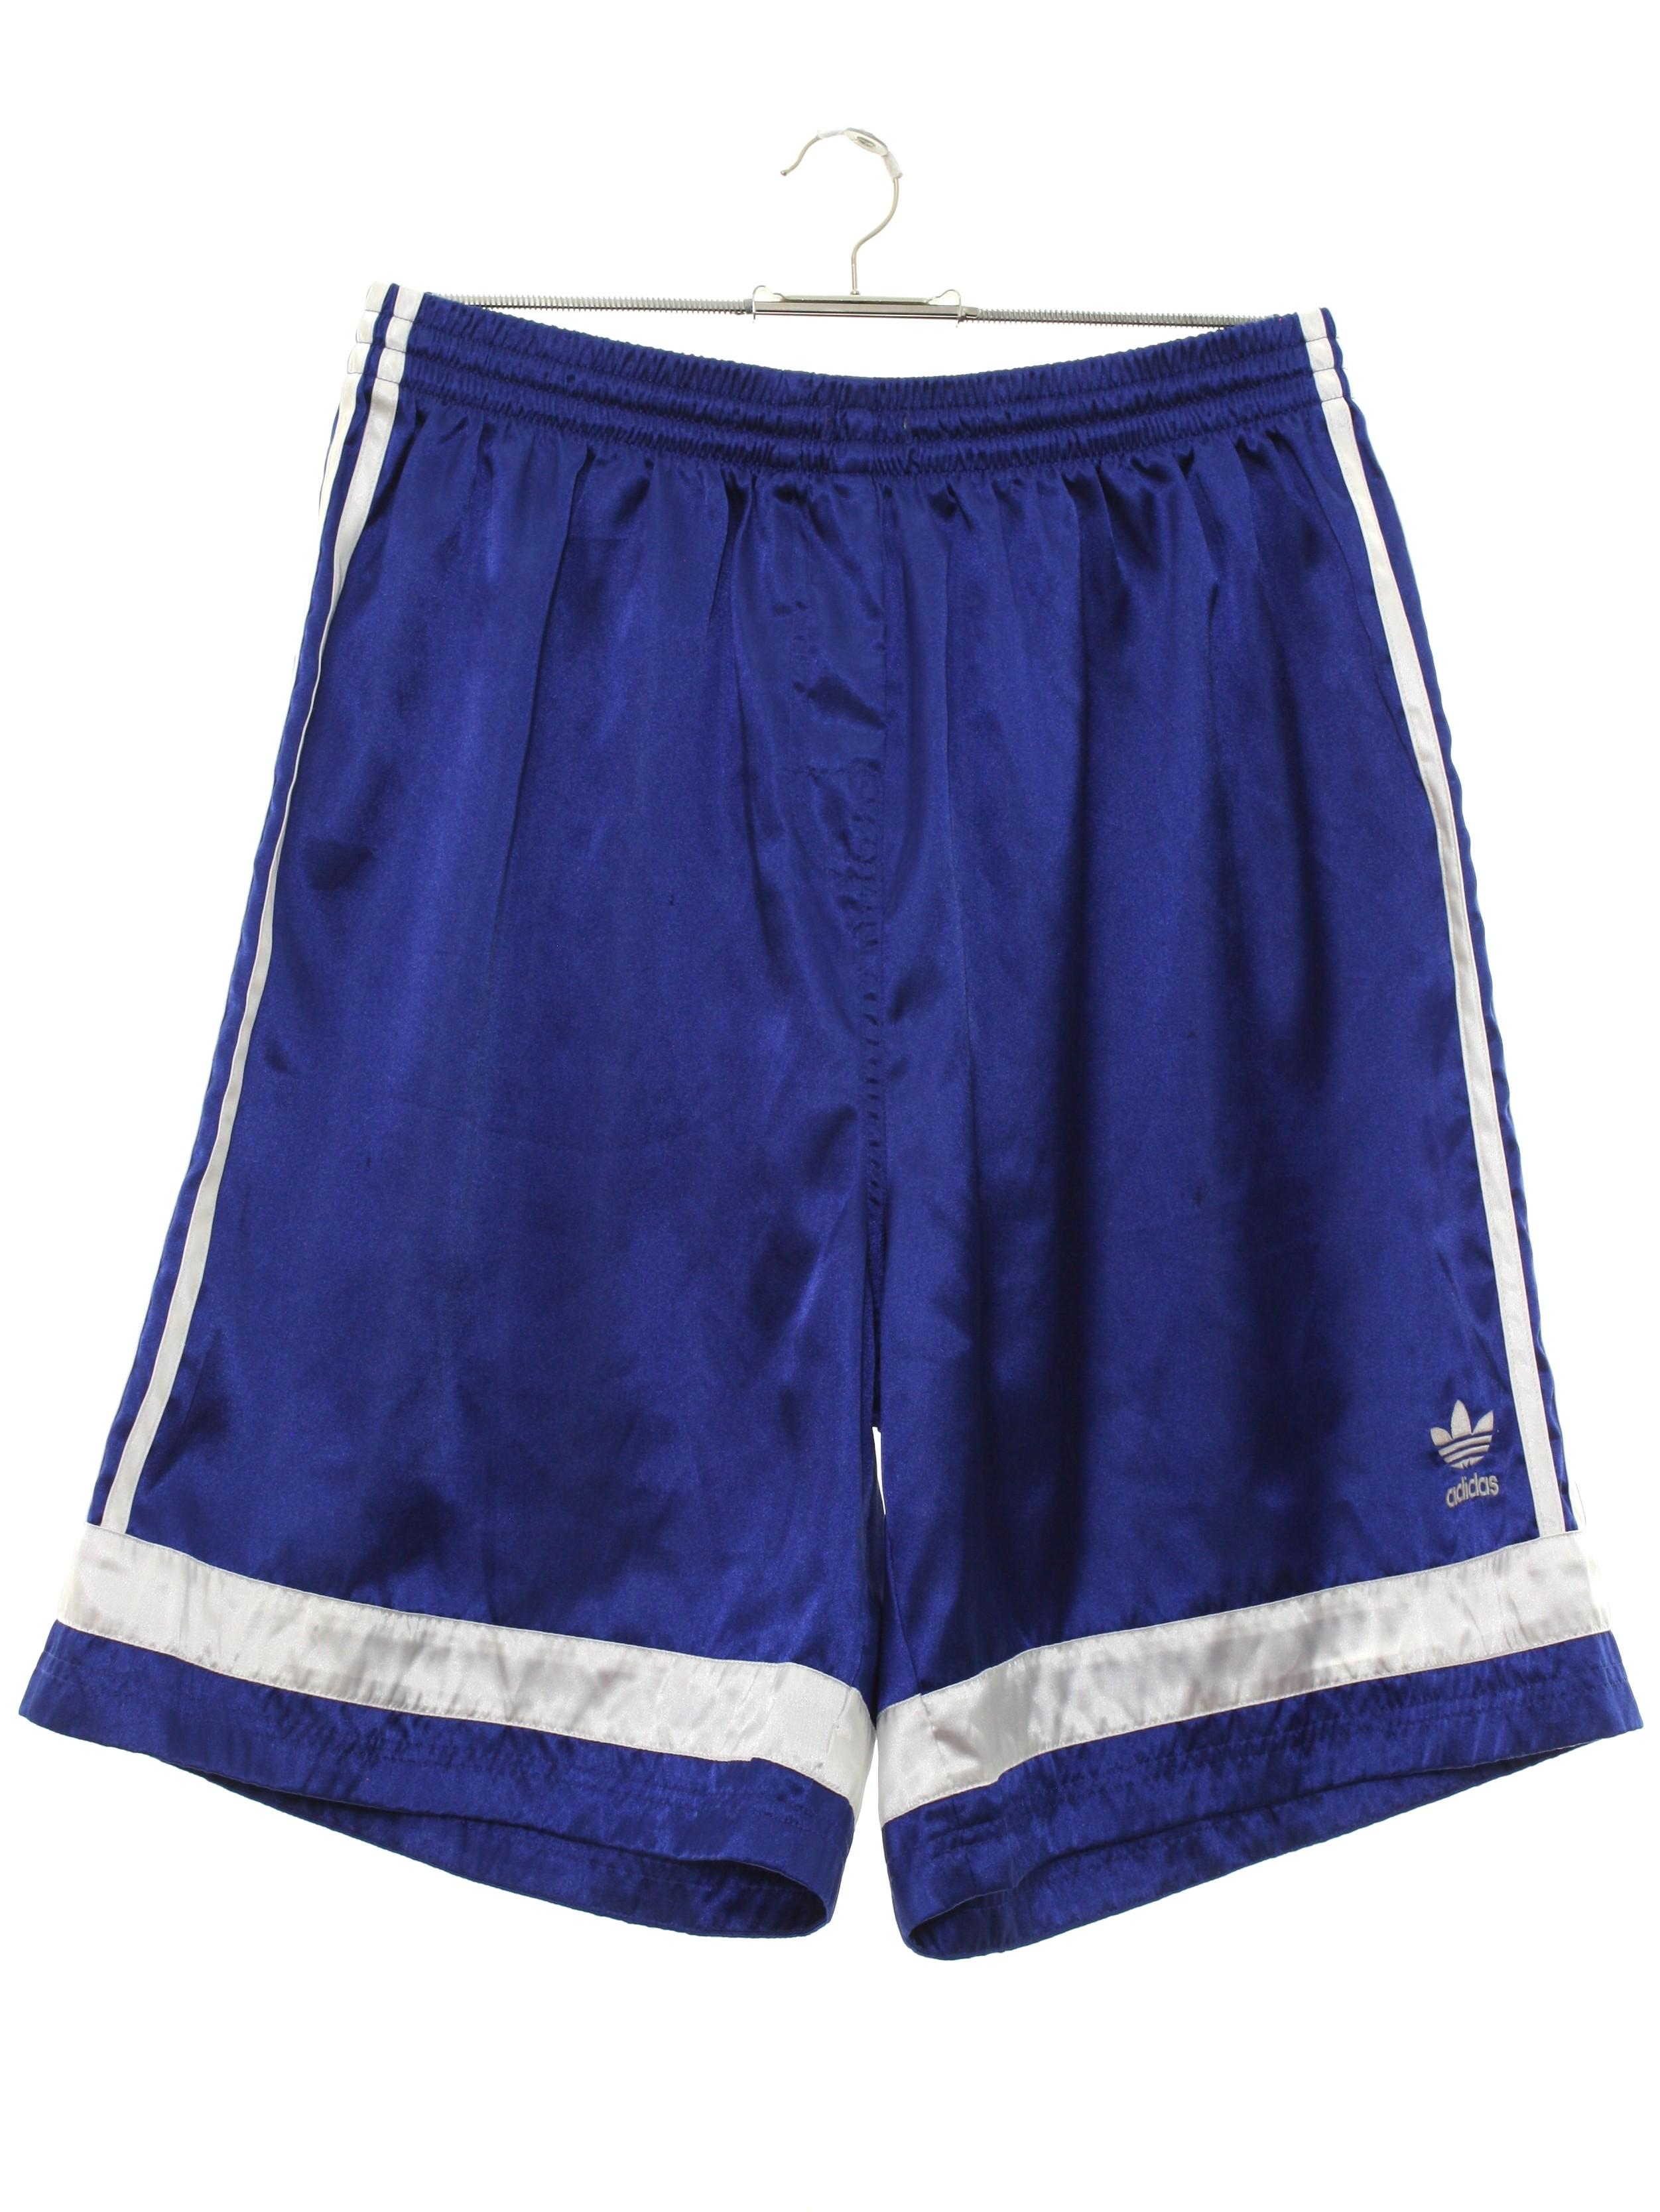 5a17c3020f Vintage 1990's Shorts: 90s -Adidas- Mens shiny royal blue background ...